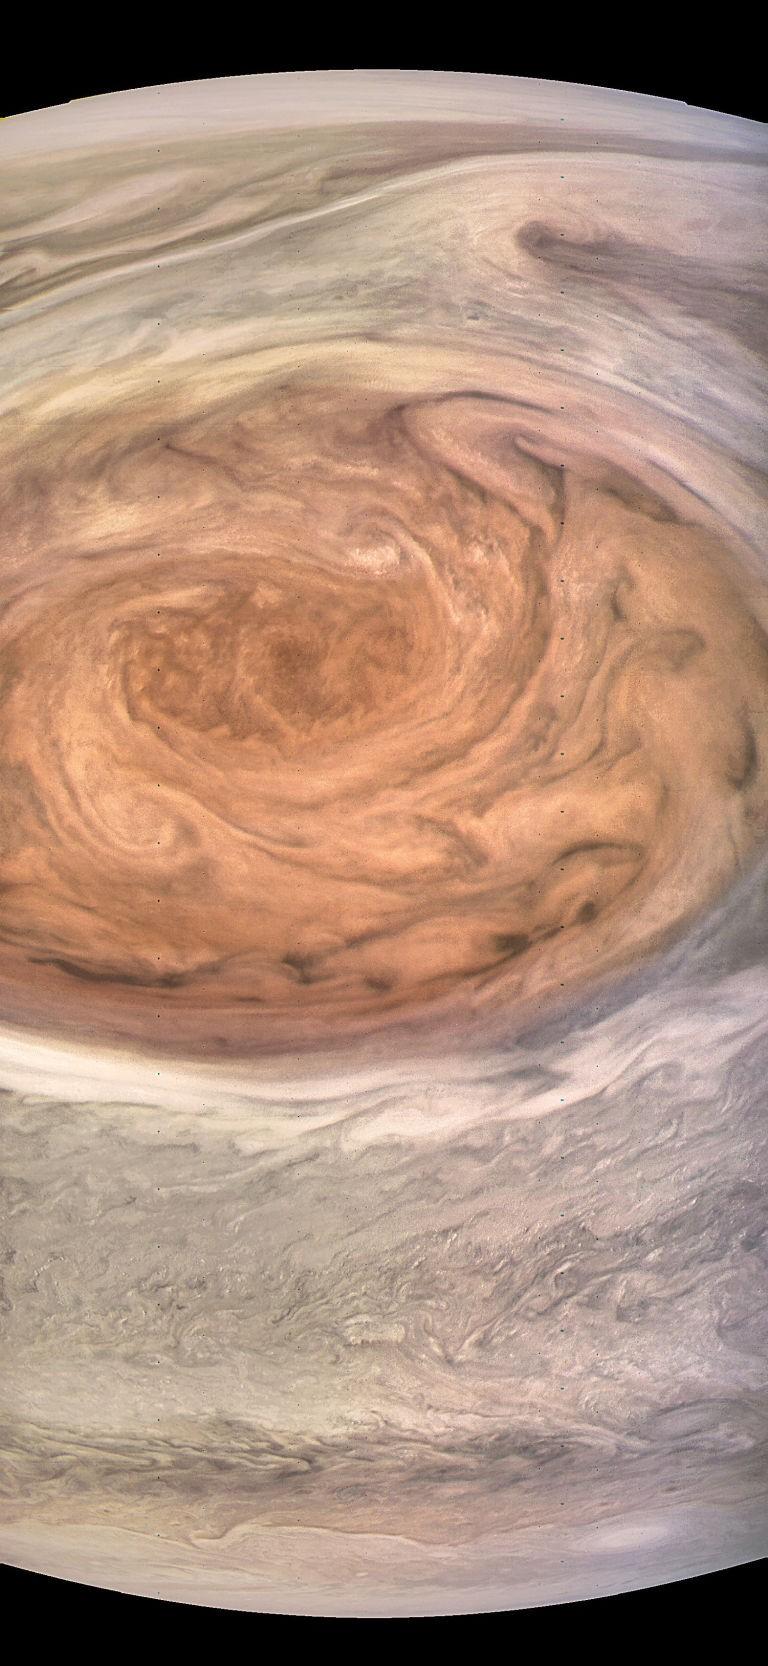 Grande Mancha Vermelha de Júpiter (Foto: NASA/JPL-Caltech/MSSS/SwRI/Kevin M. Gill)